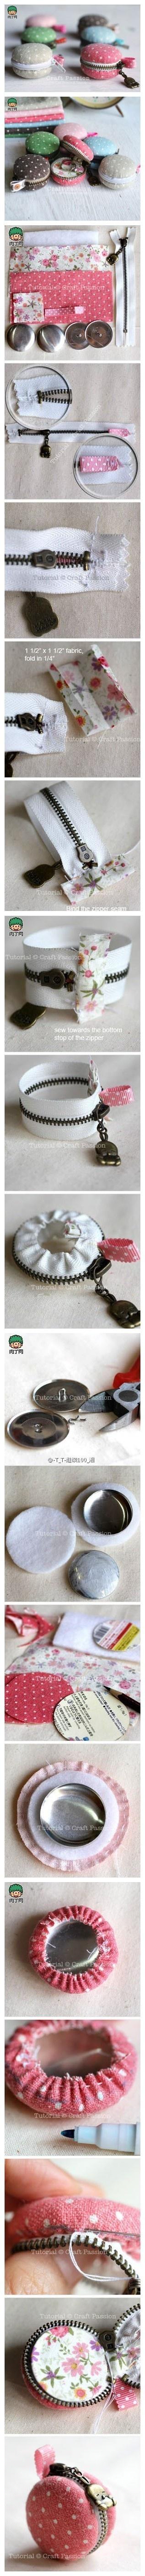 DIY macaron pouch